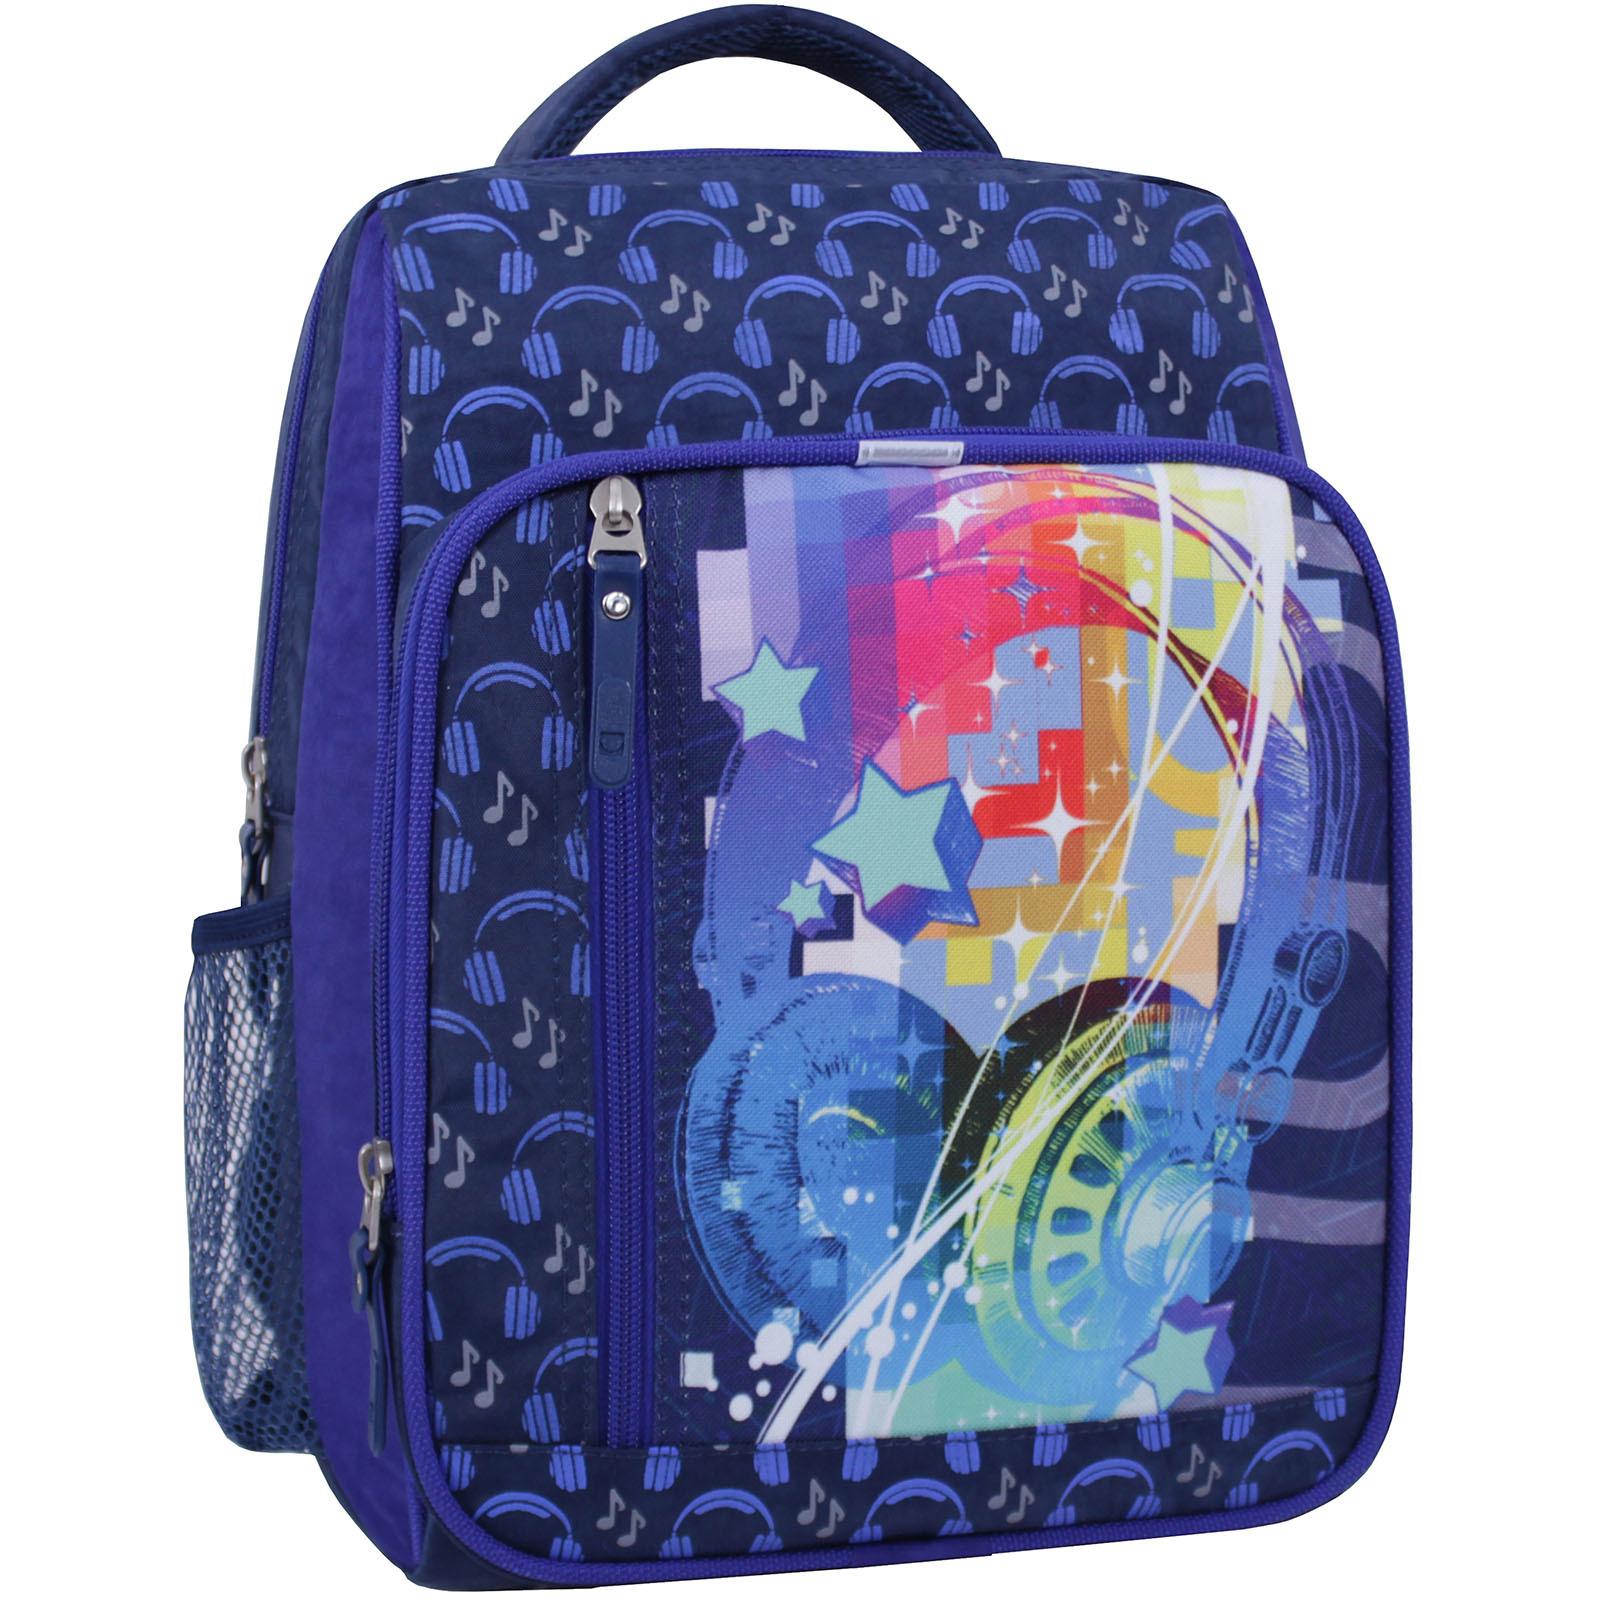 Школьные рюкзаки Рюкзак школьный Bagland Школьник 8 л. 225 синий 614 (00112702) IMG_1640_СУБ.614_.JPG